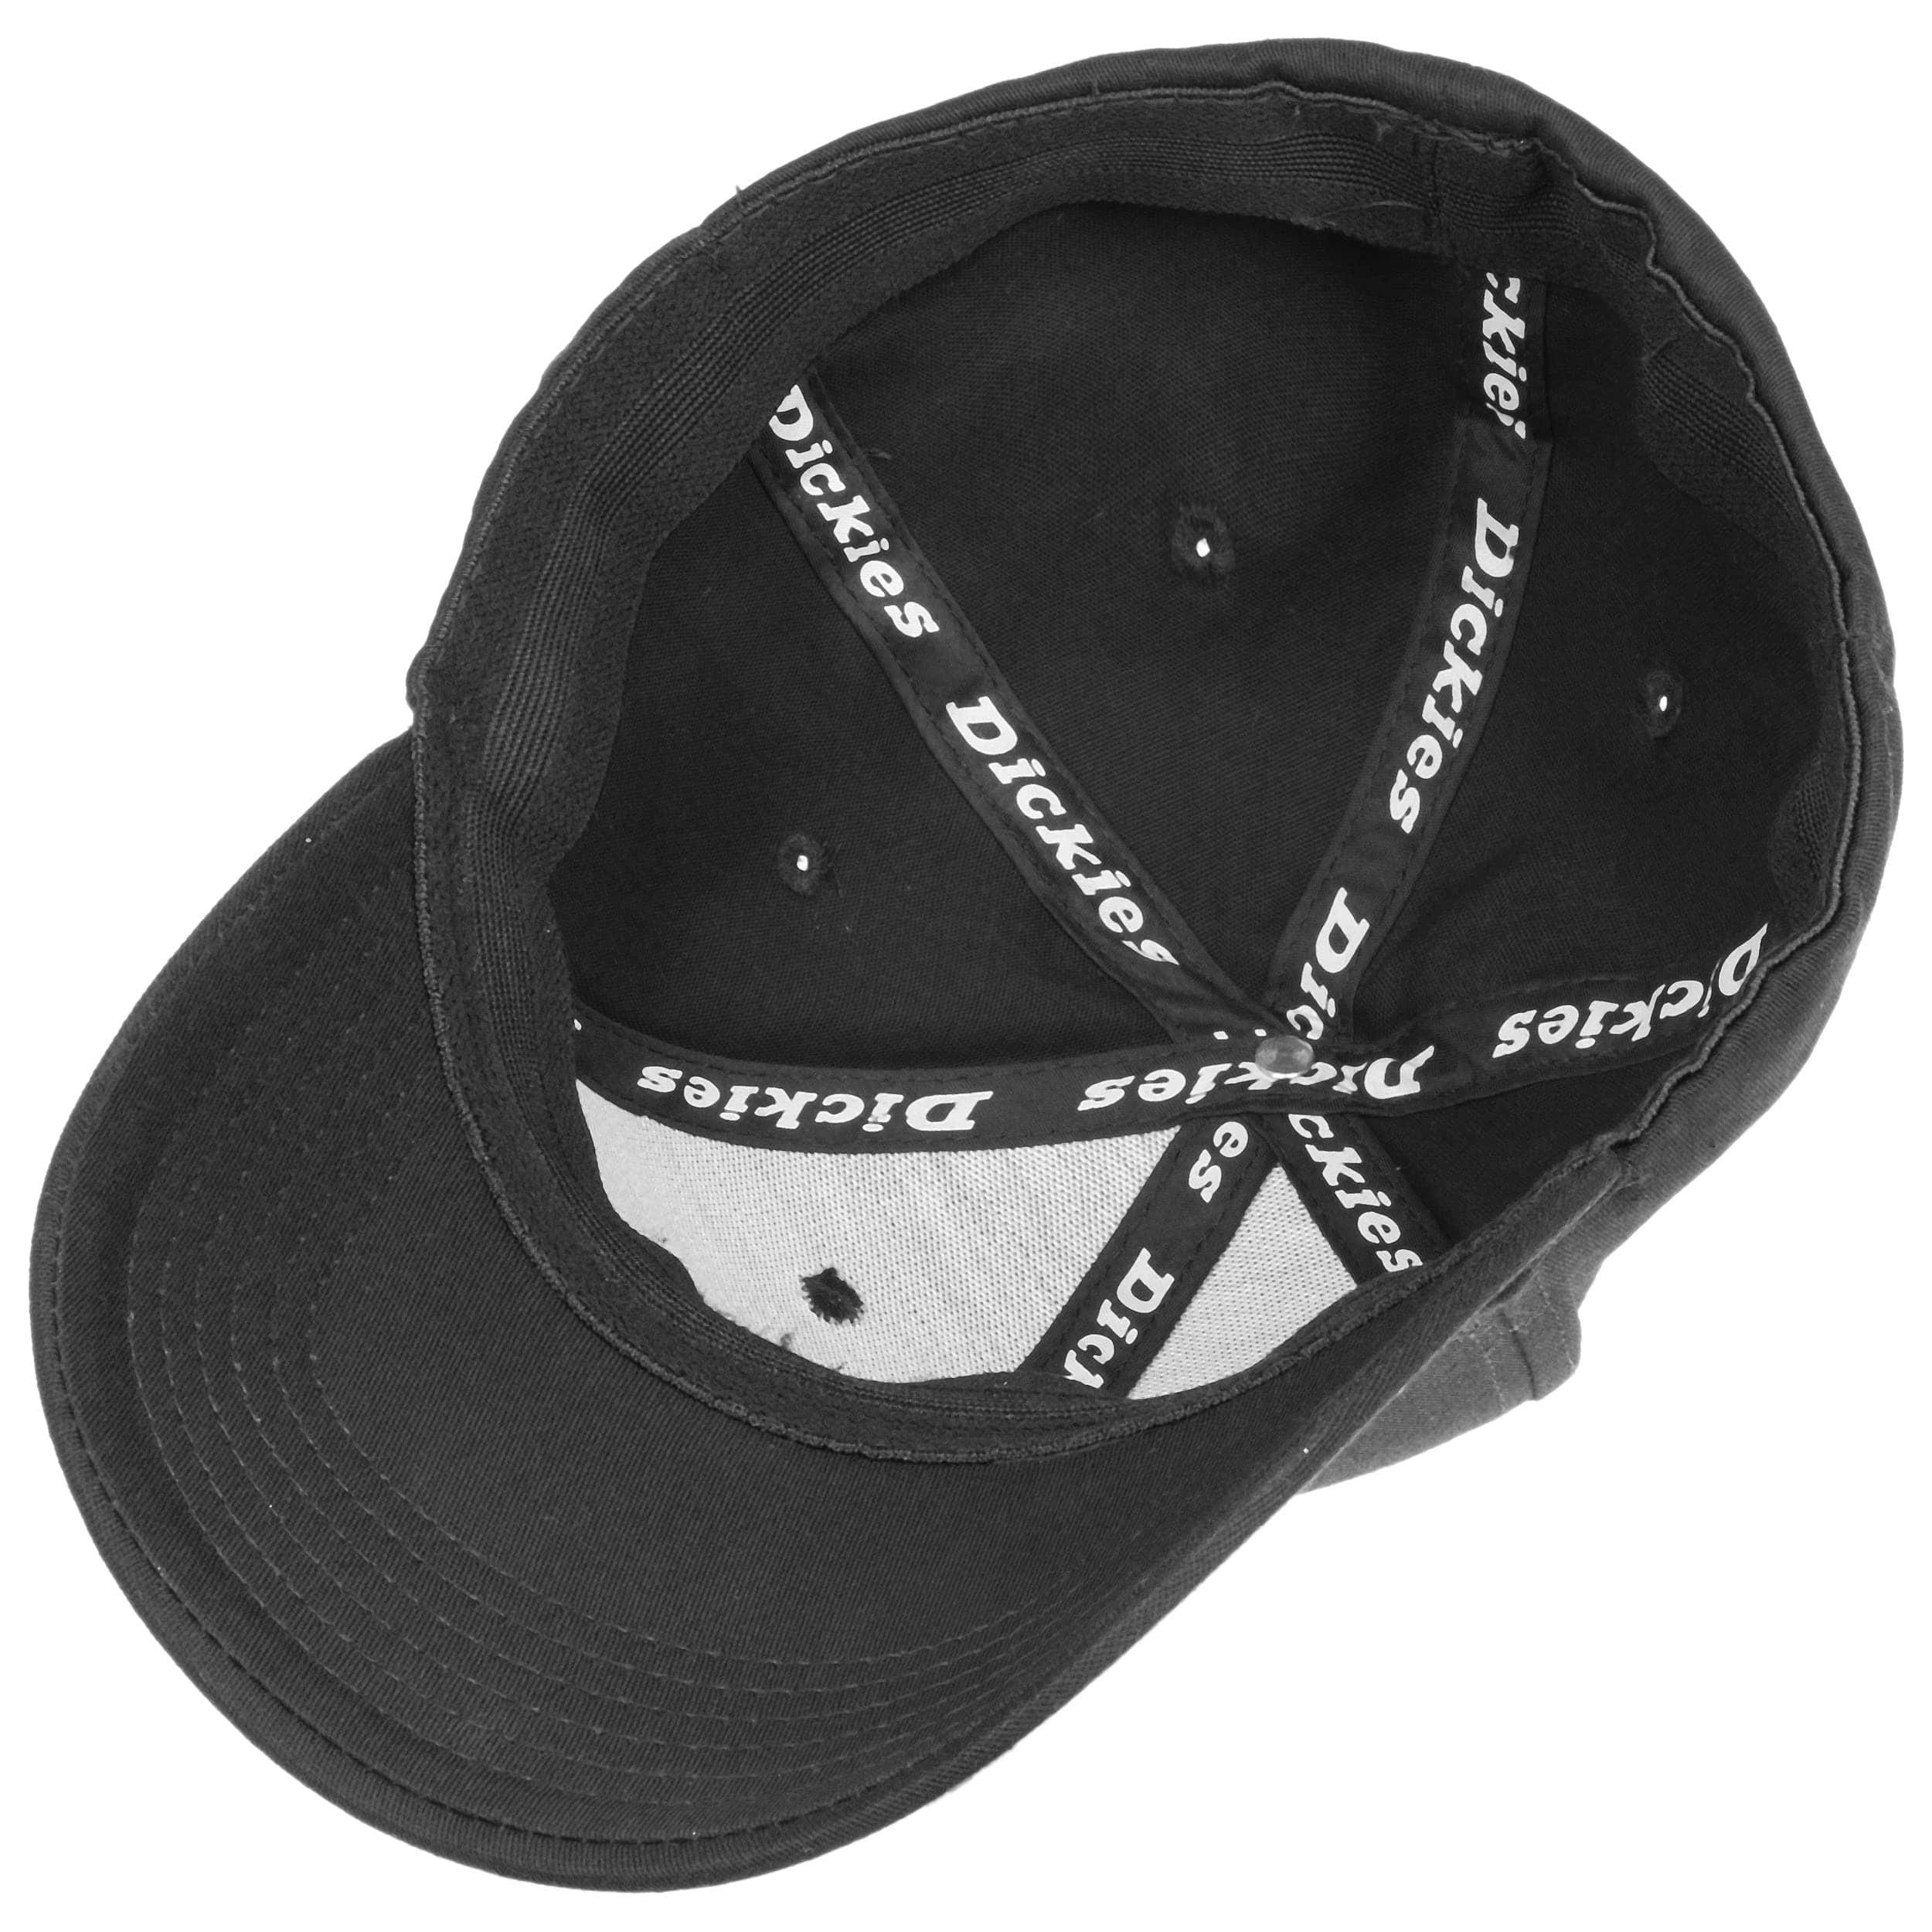 Gorra Morrilton by Dickies - Gorras - sombreroshop.es 5999d30b1e9